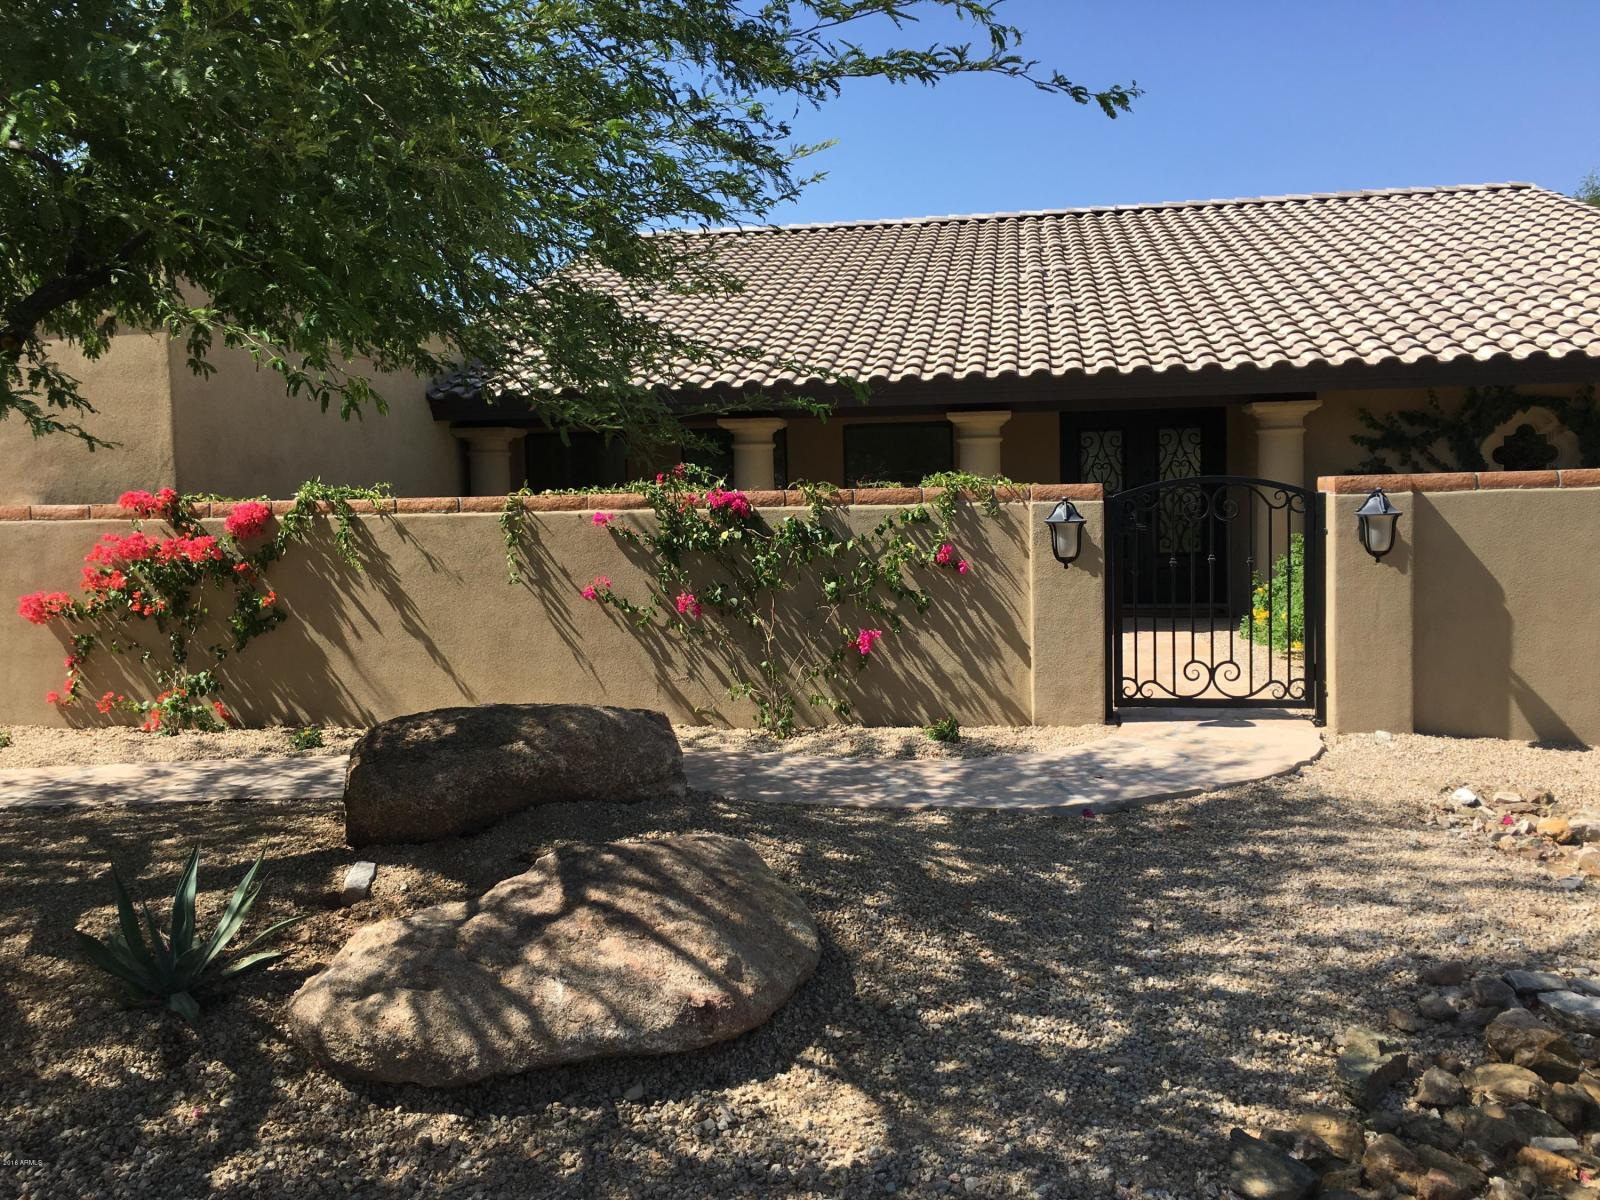 4554 E Onyx Ave, Phoenix | $675,000